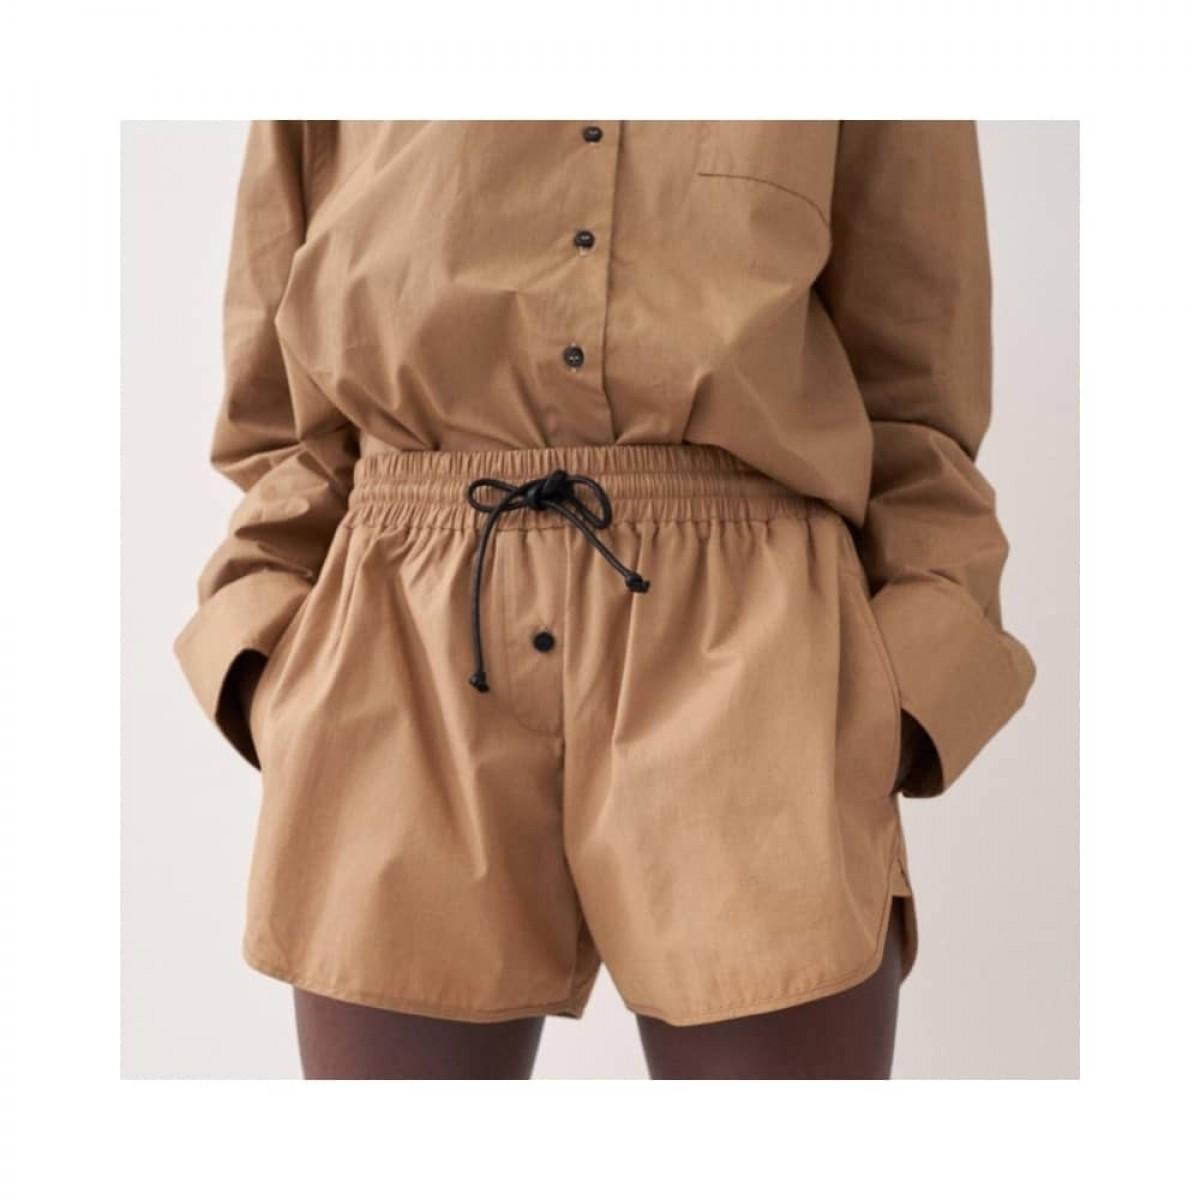 jett shorts - khaki